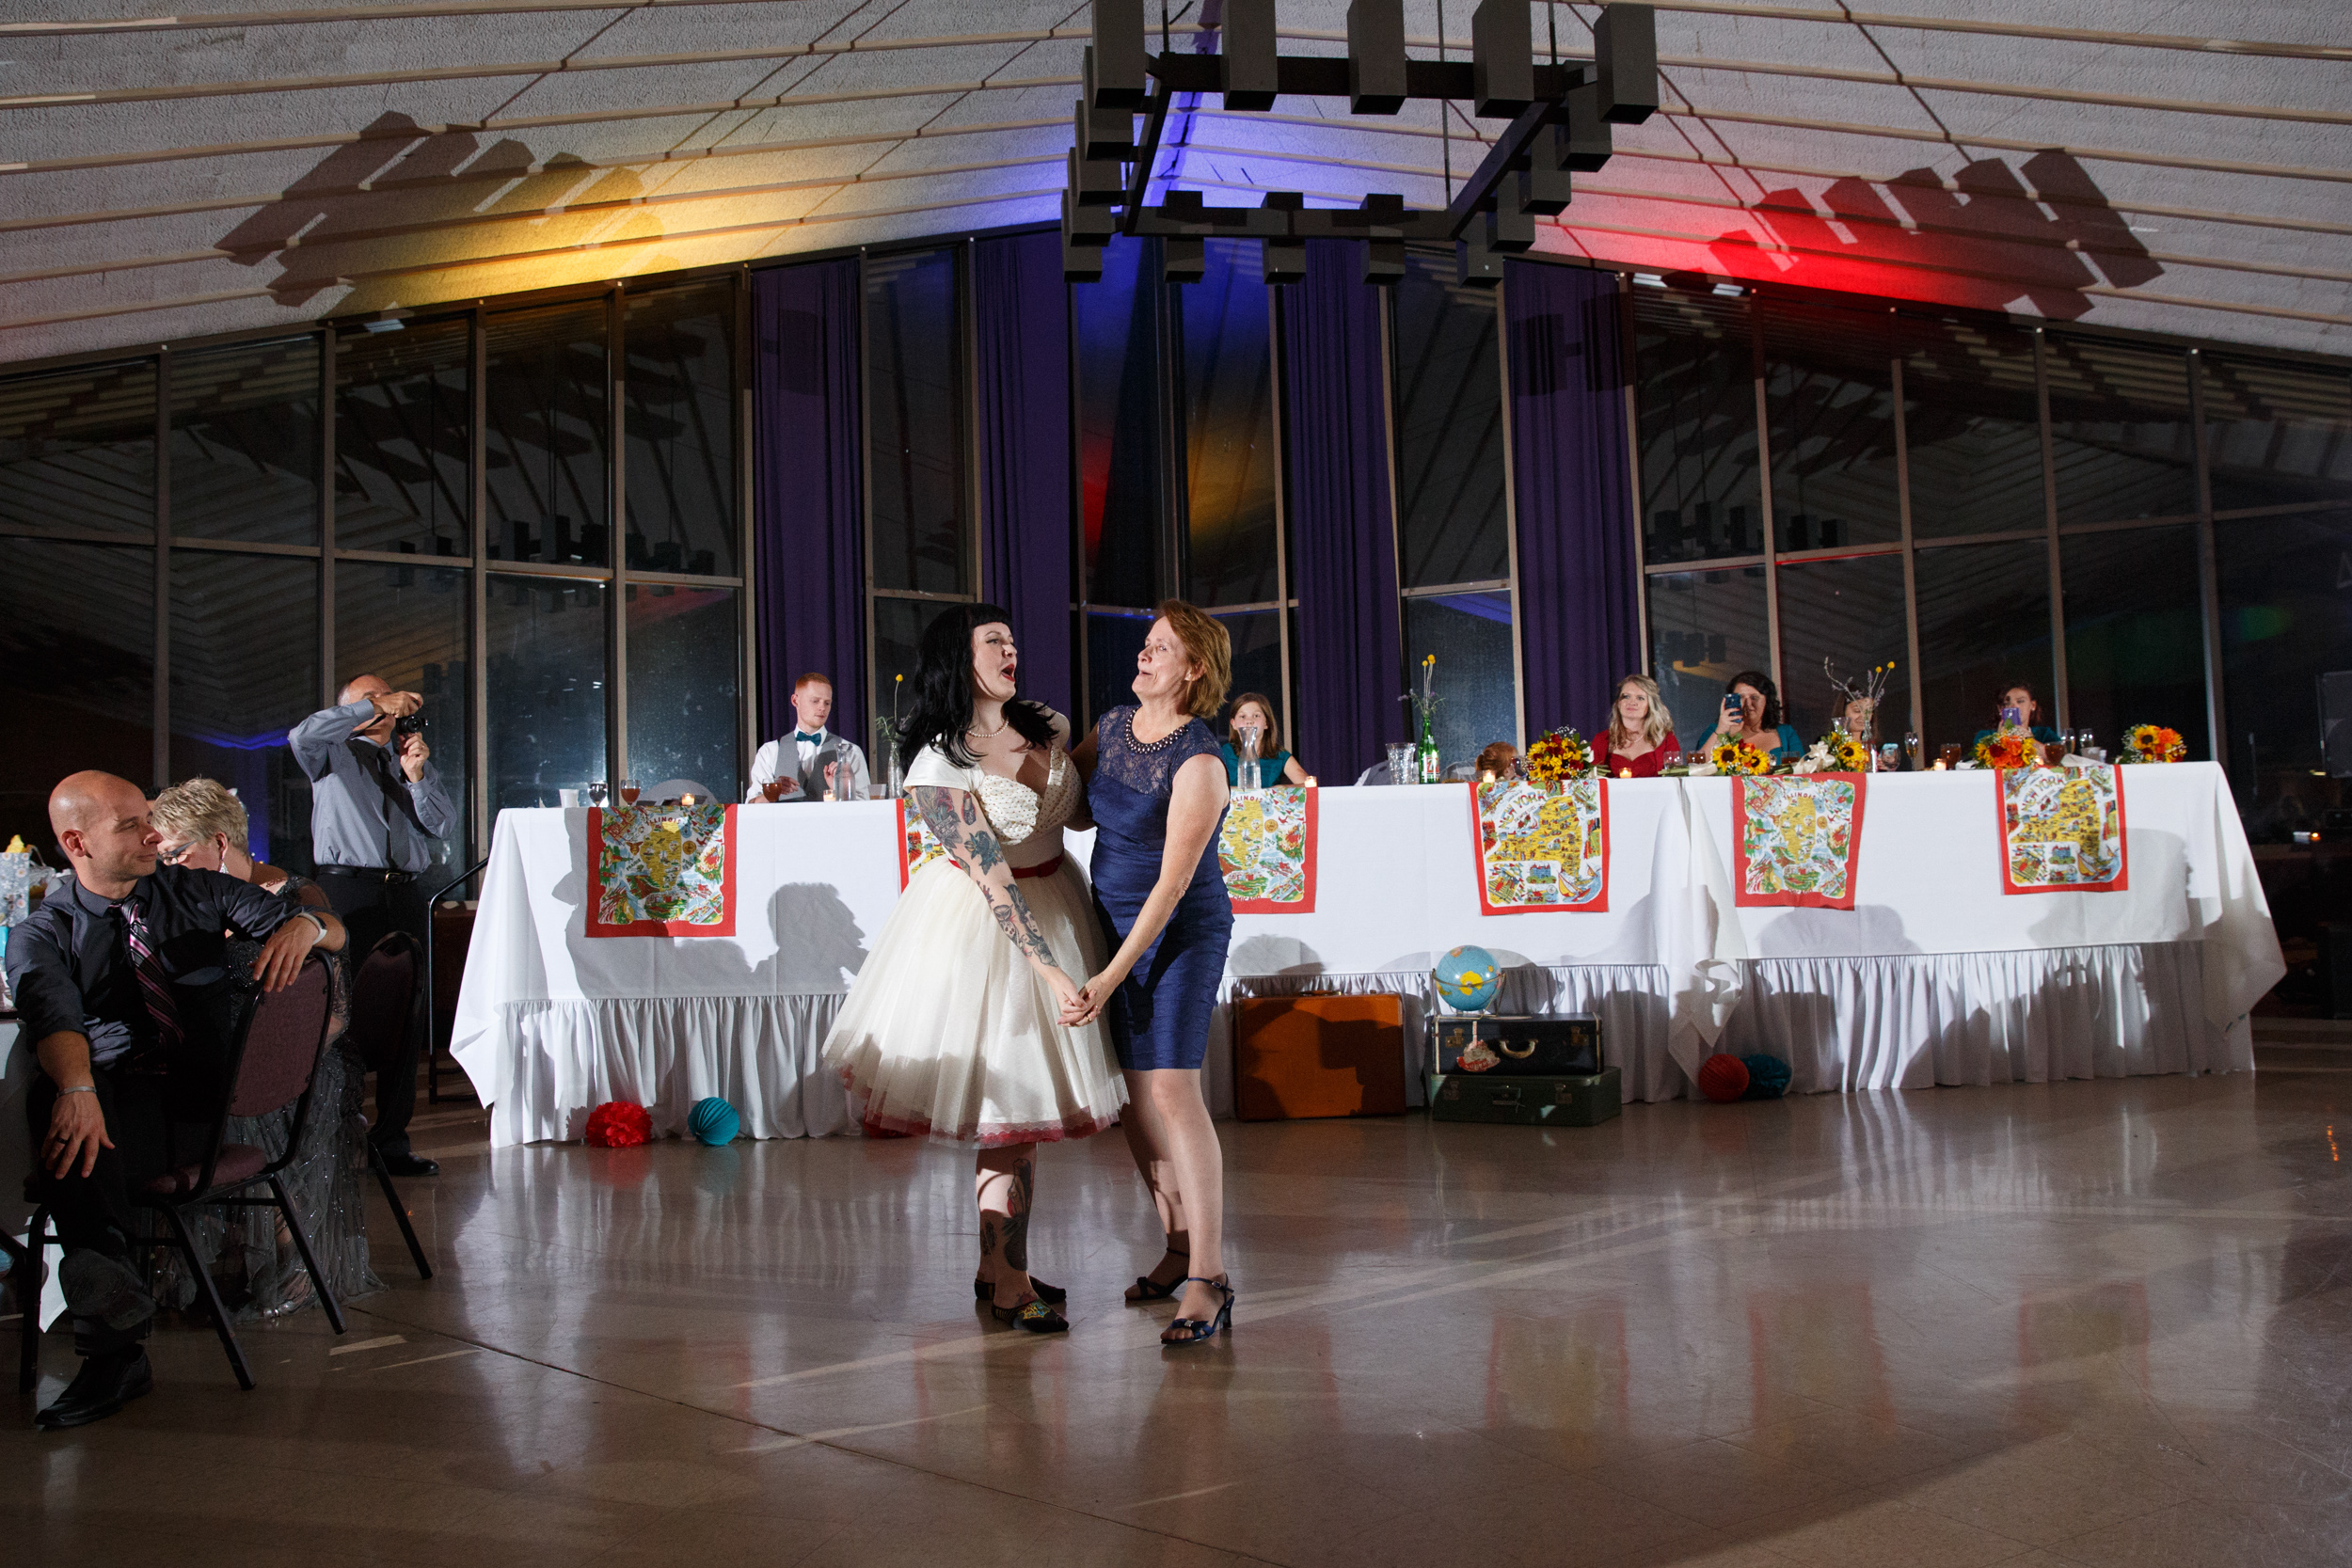 Christian & Sarah wedding photography by Brian milo-244.jpg